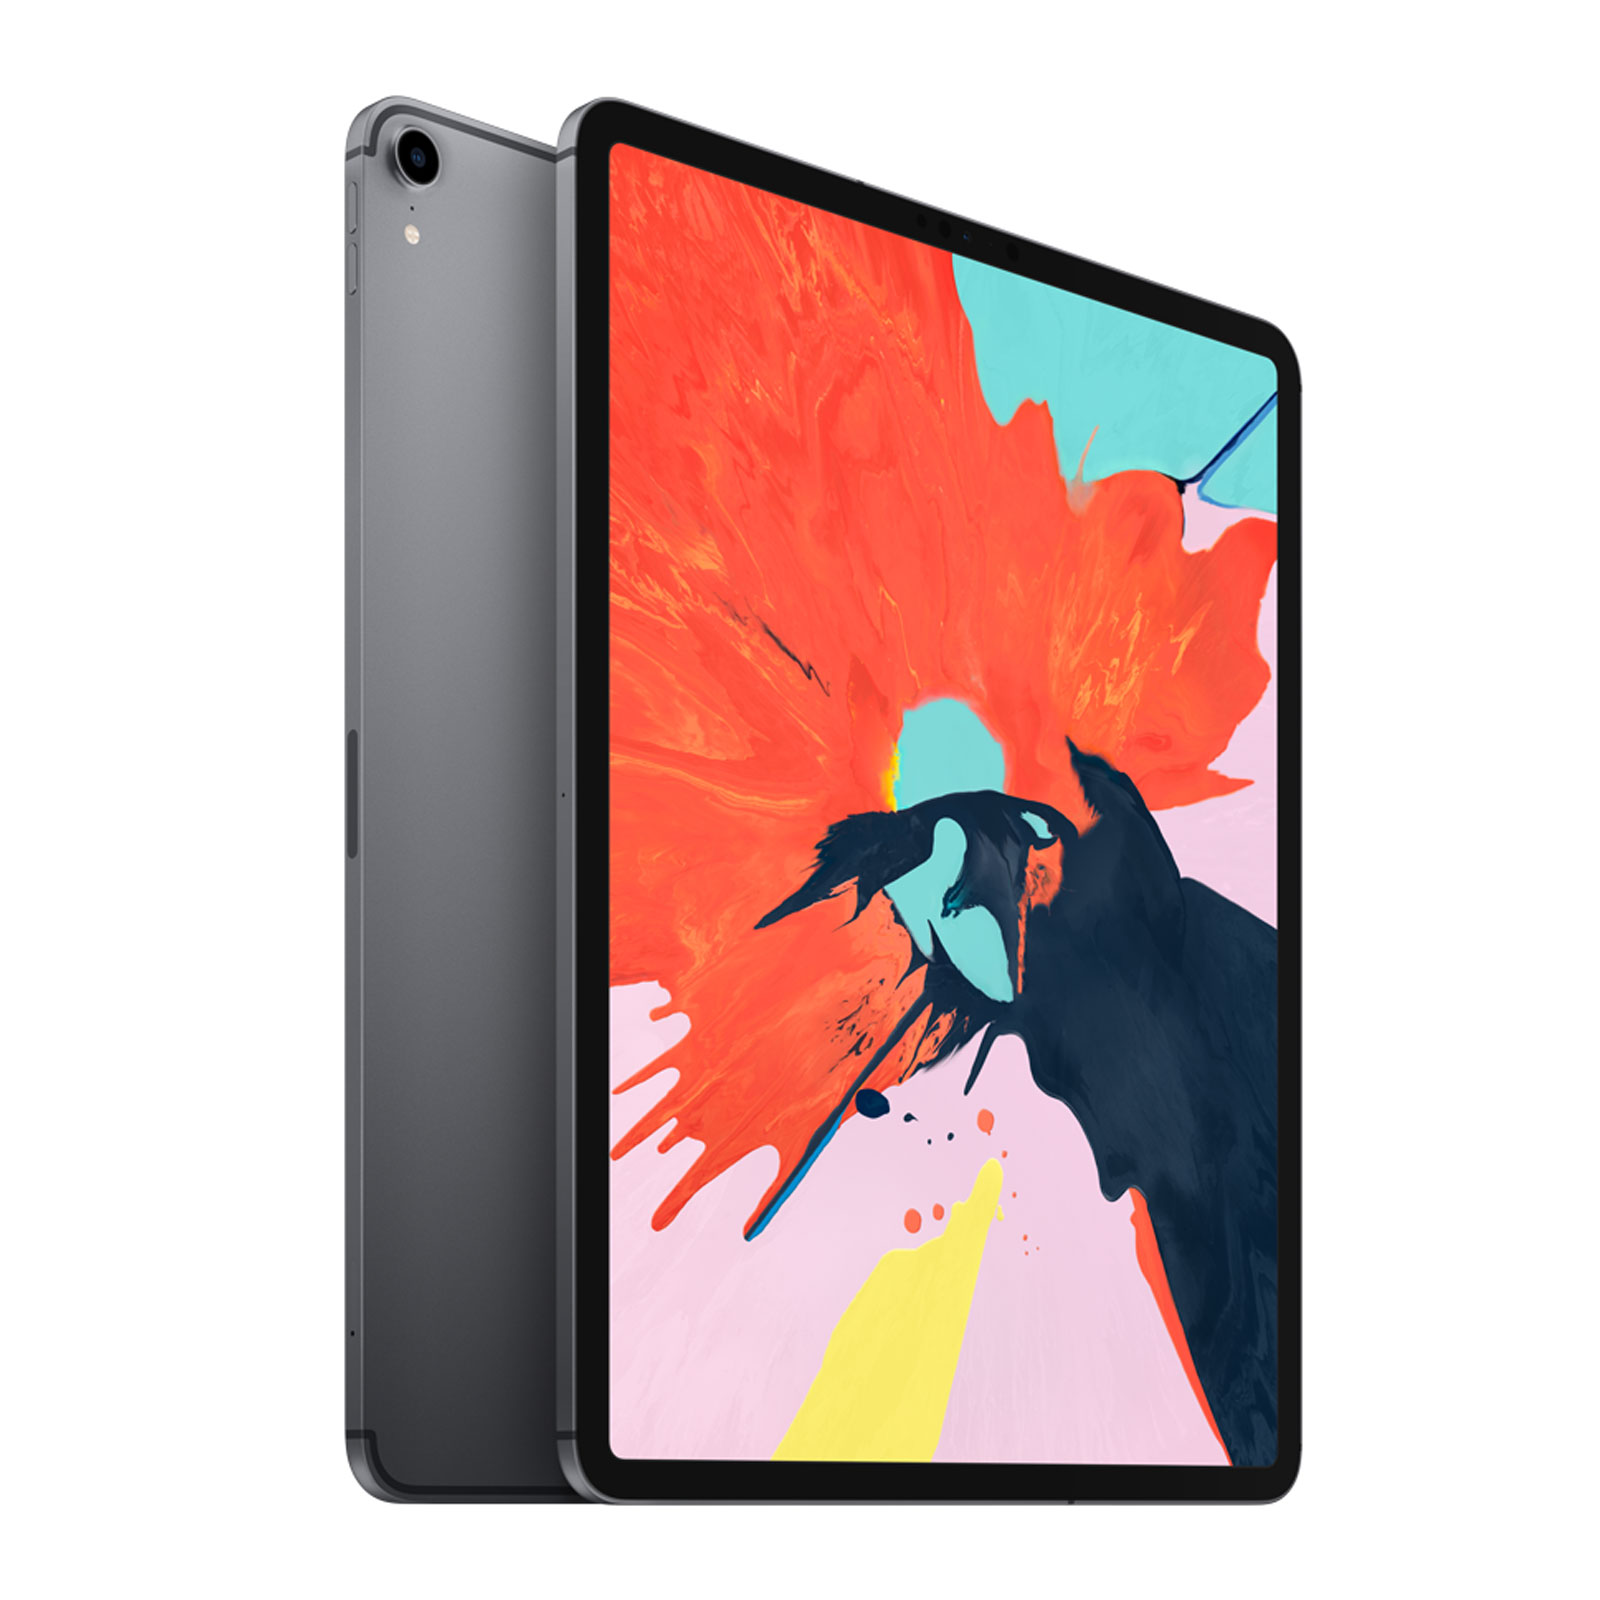 apple ipad pro 12 9 inch 64gb space grau cellular. Black Bedroom Furniture Sets. Home Design Ideas